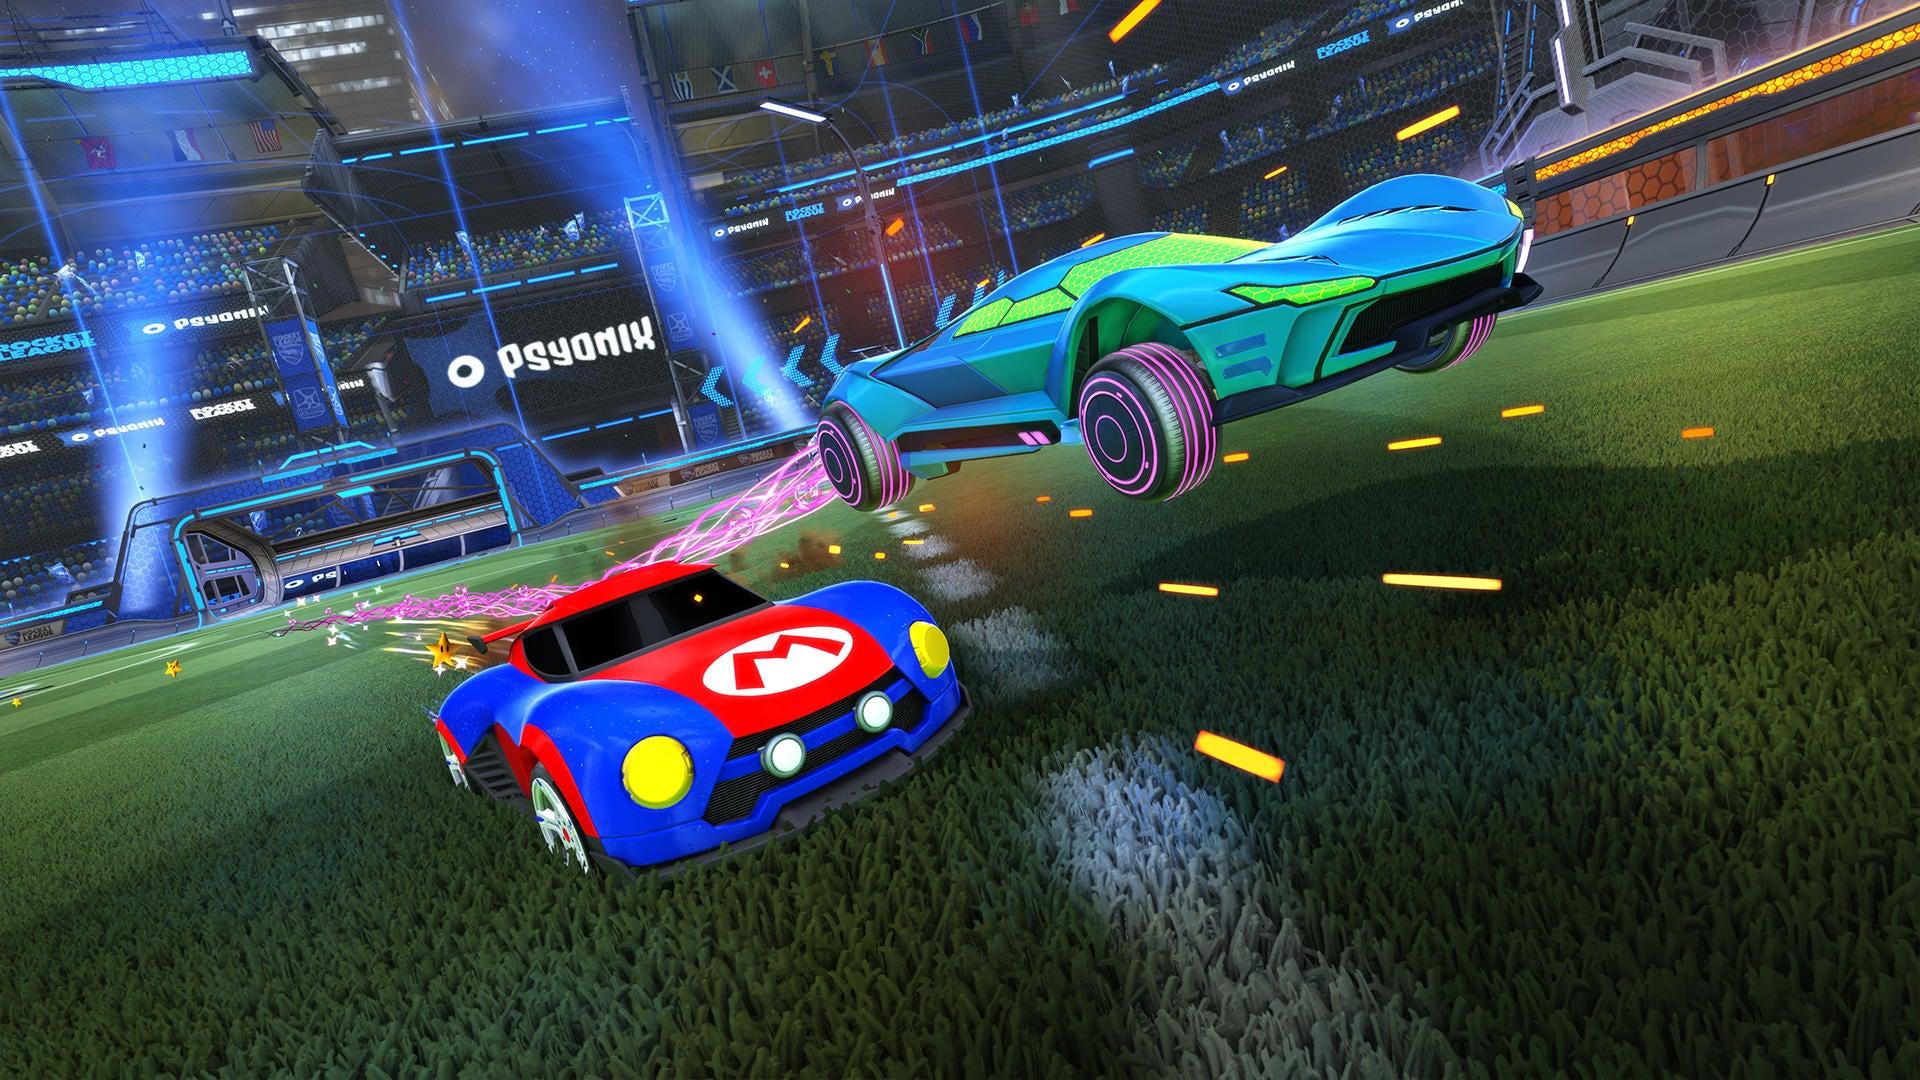 Rocket League Arrives on Nintendo Switch Next Month Image